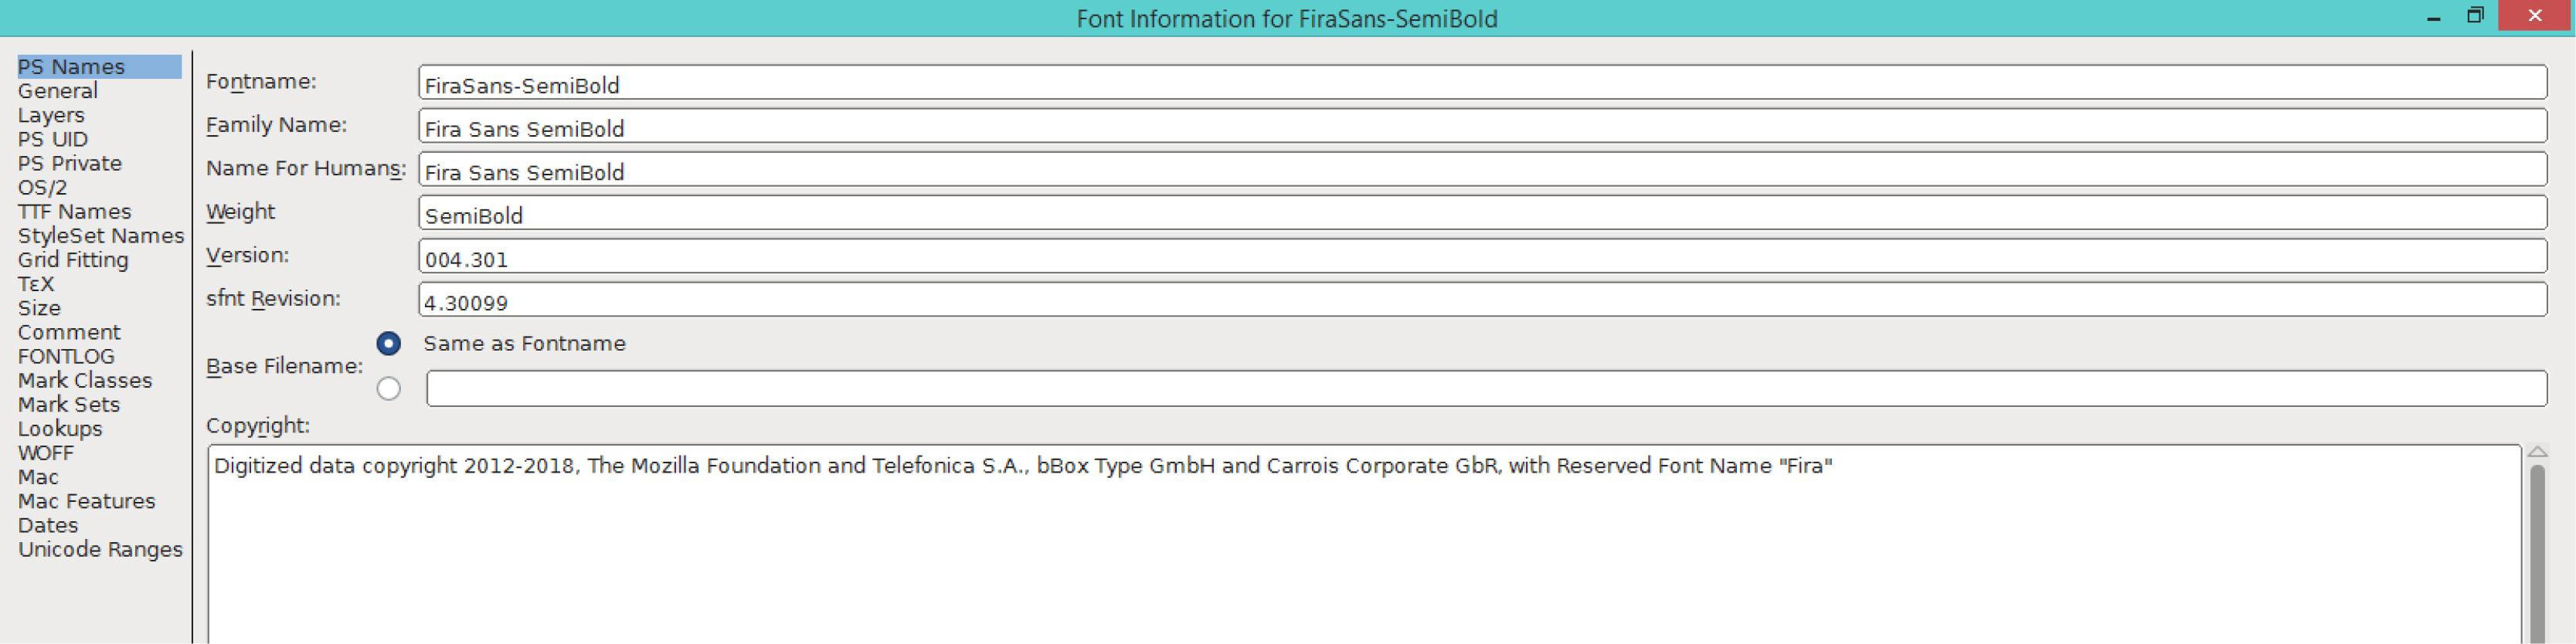 Fira Sans SemiBold (PS)